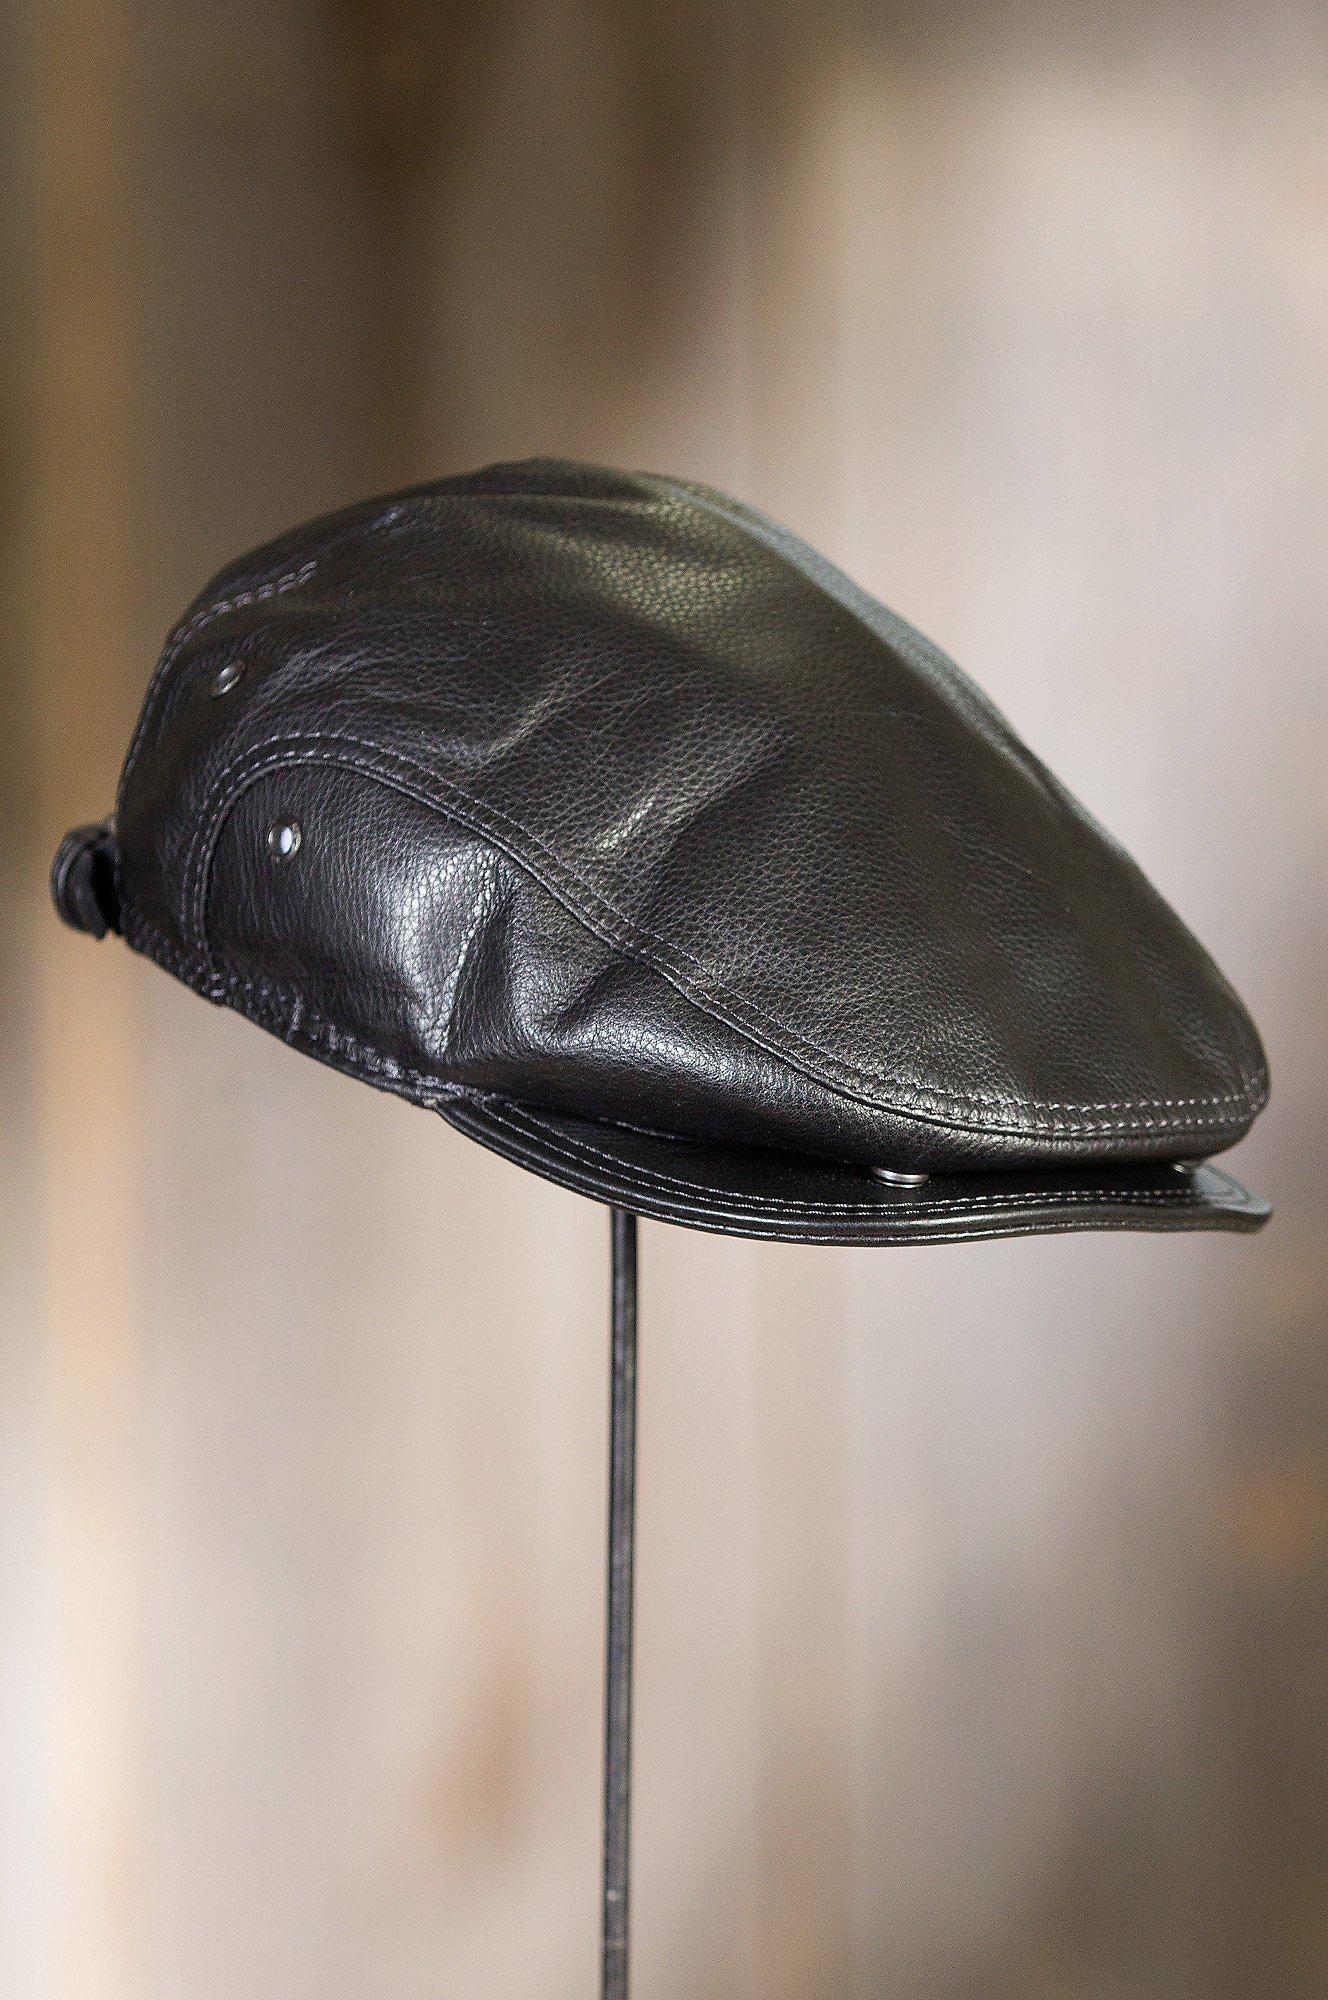 Overland Sheepskin Co. Allen Leather IVY Cap, Black, Size Large (7 1/4-7 3/8) by Overland Sheepskin Co (Image #7)